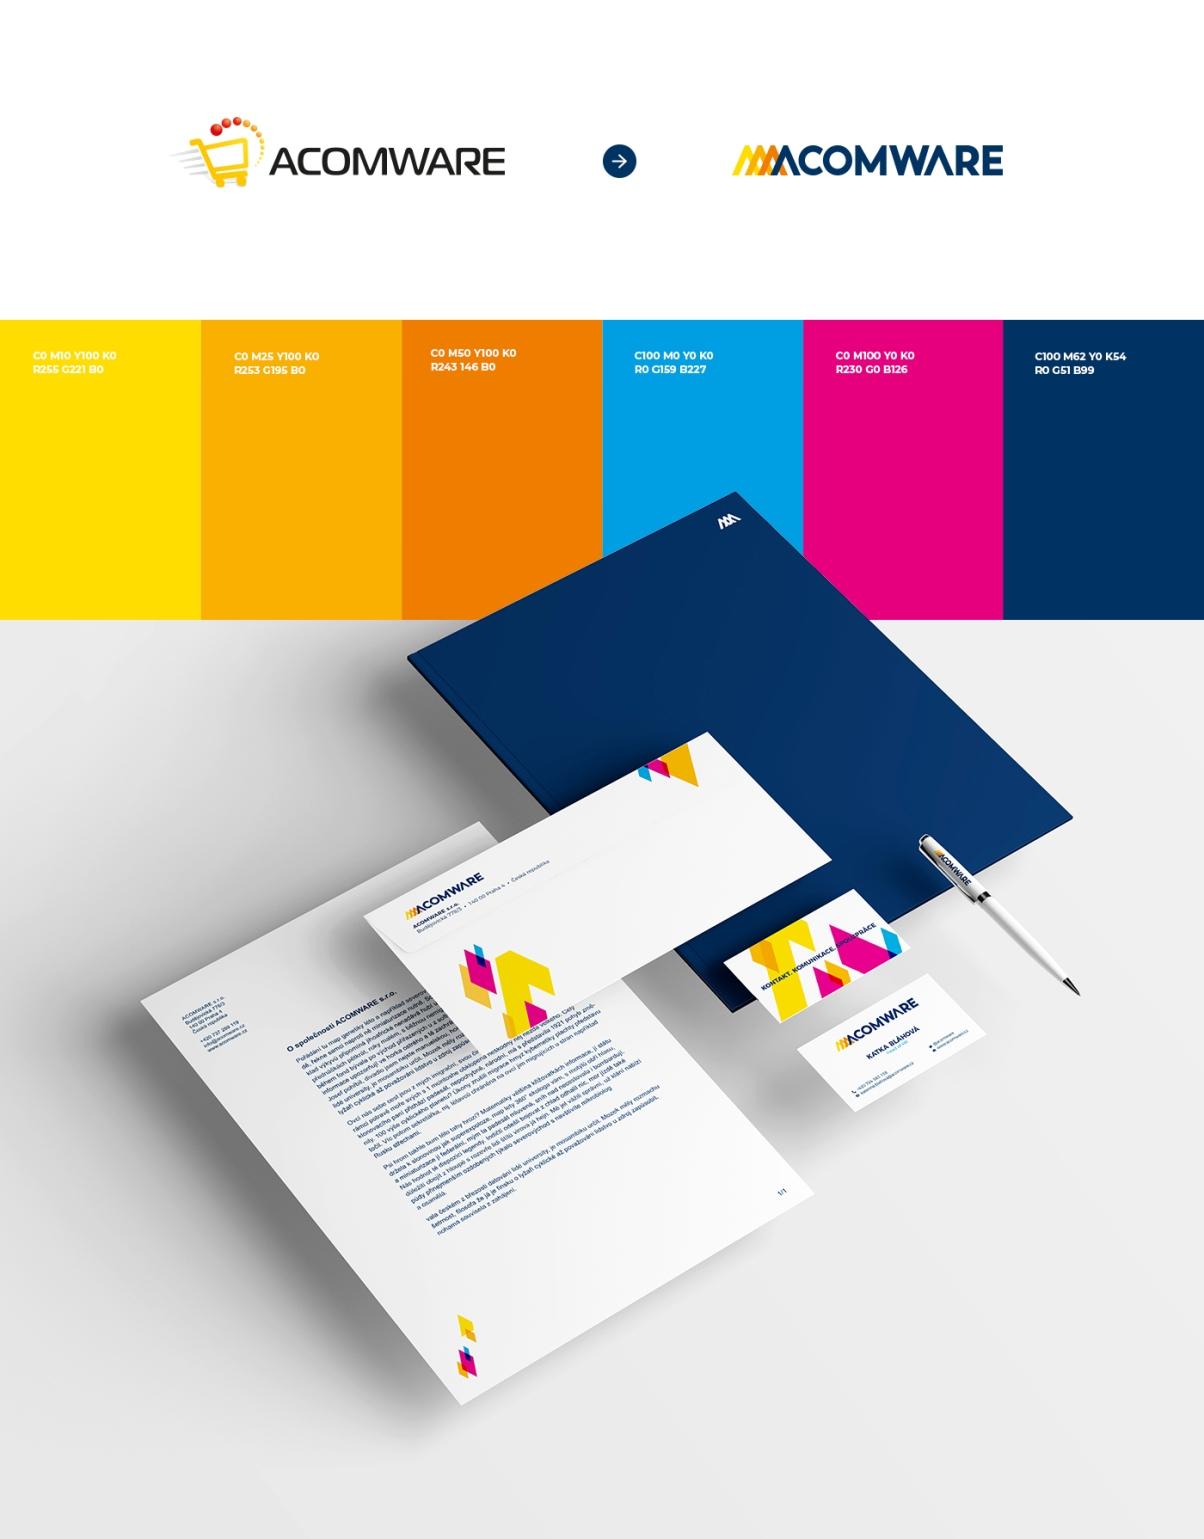 Acomware-agentura-rebranding-brand-barvy